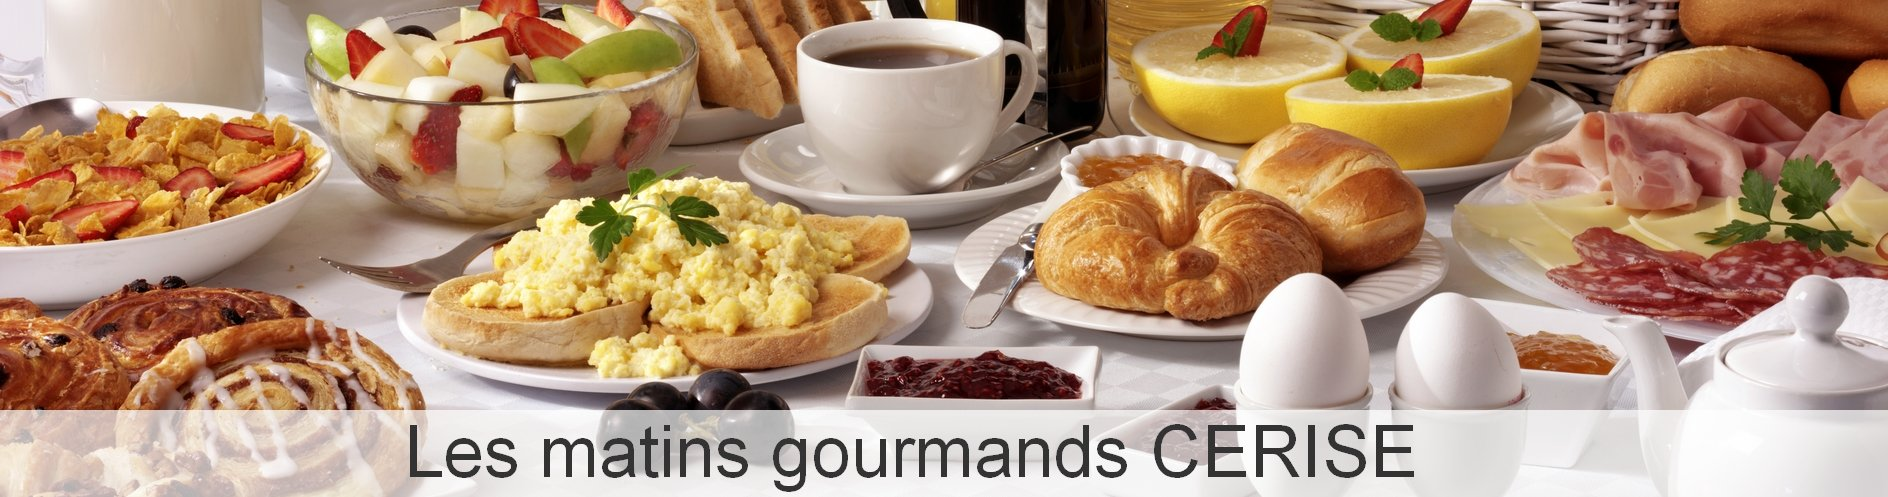 cerise-hotel-residence-les-matins-gourmands-petit-dejeuner-FR.jpg